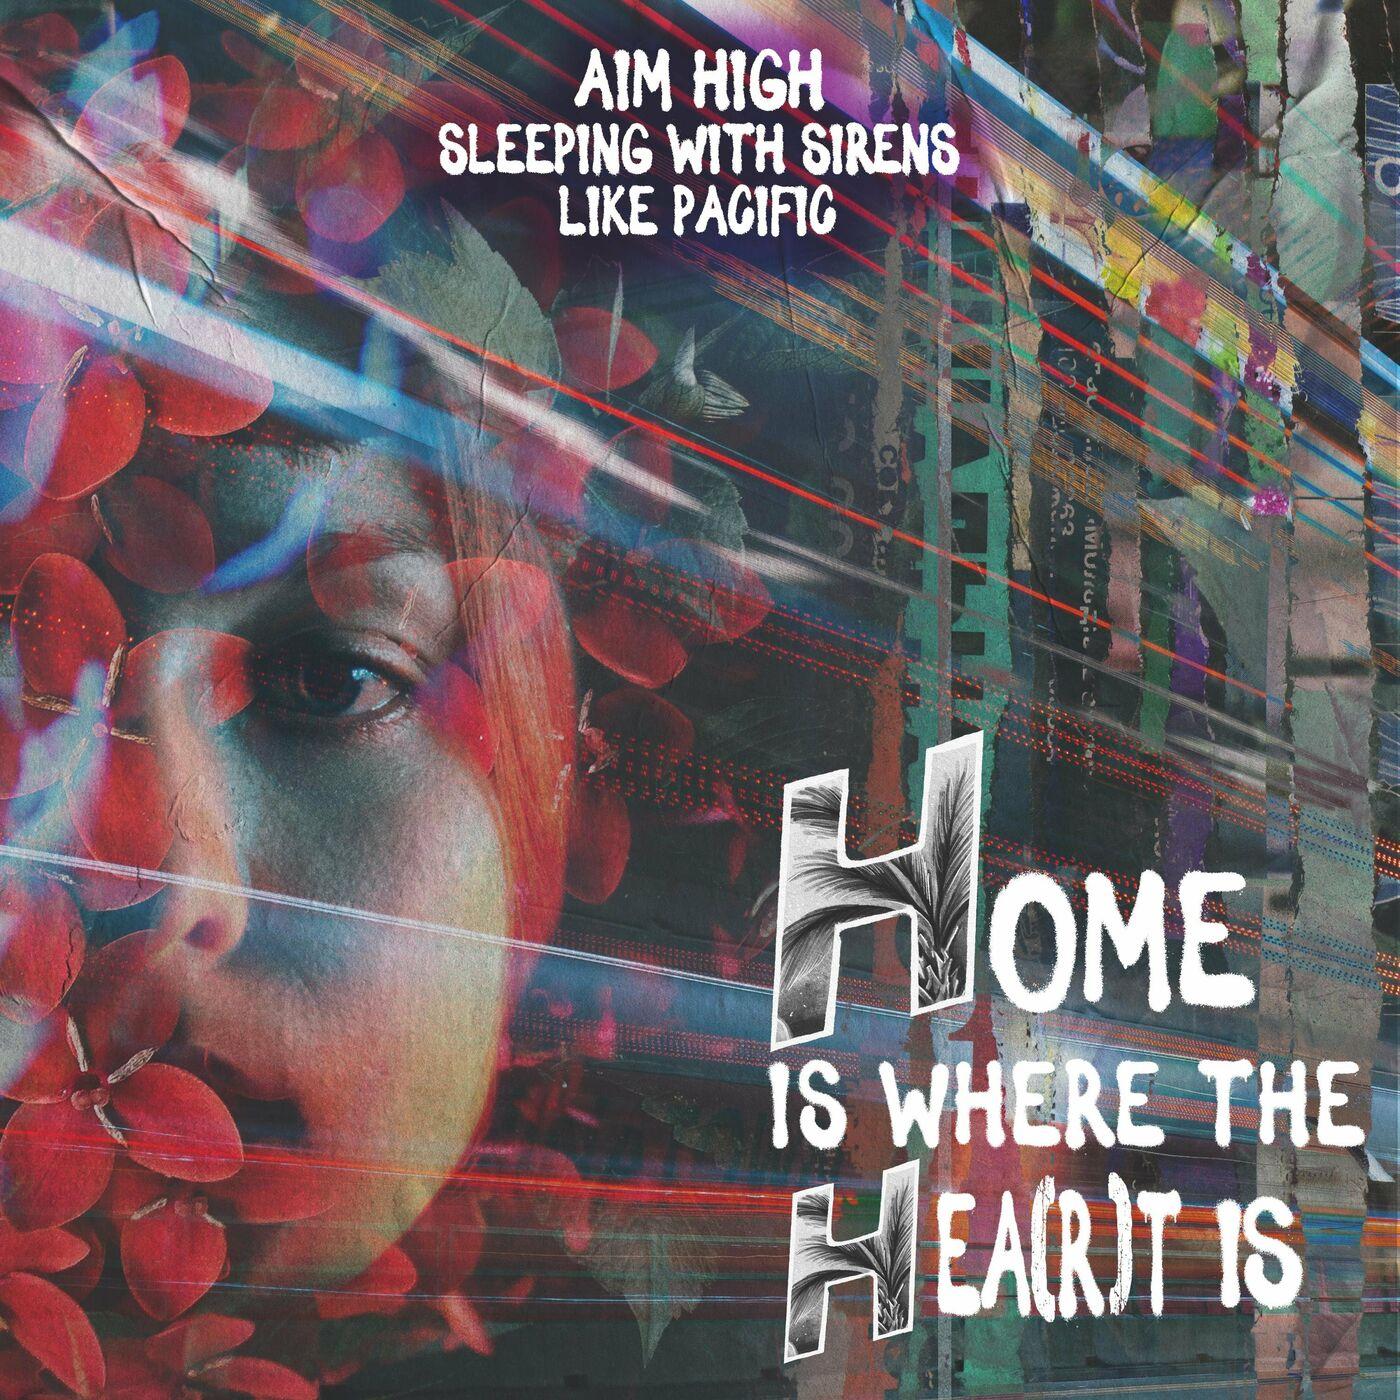 Aim High - Home Is Where The Hea(r)t Is [single] (2021)